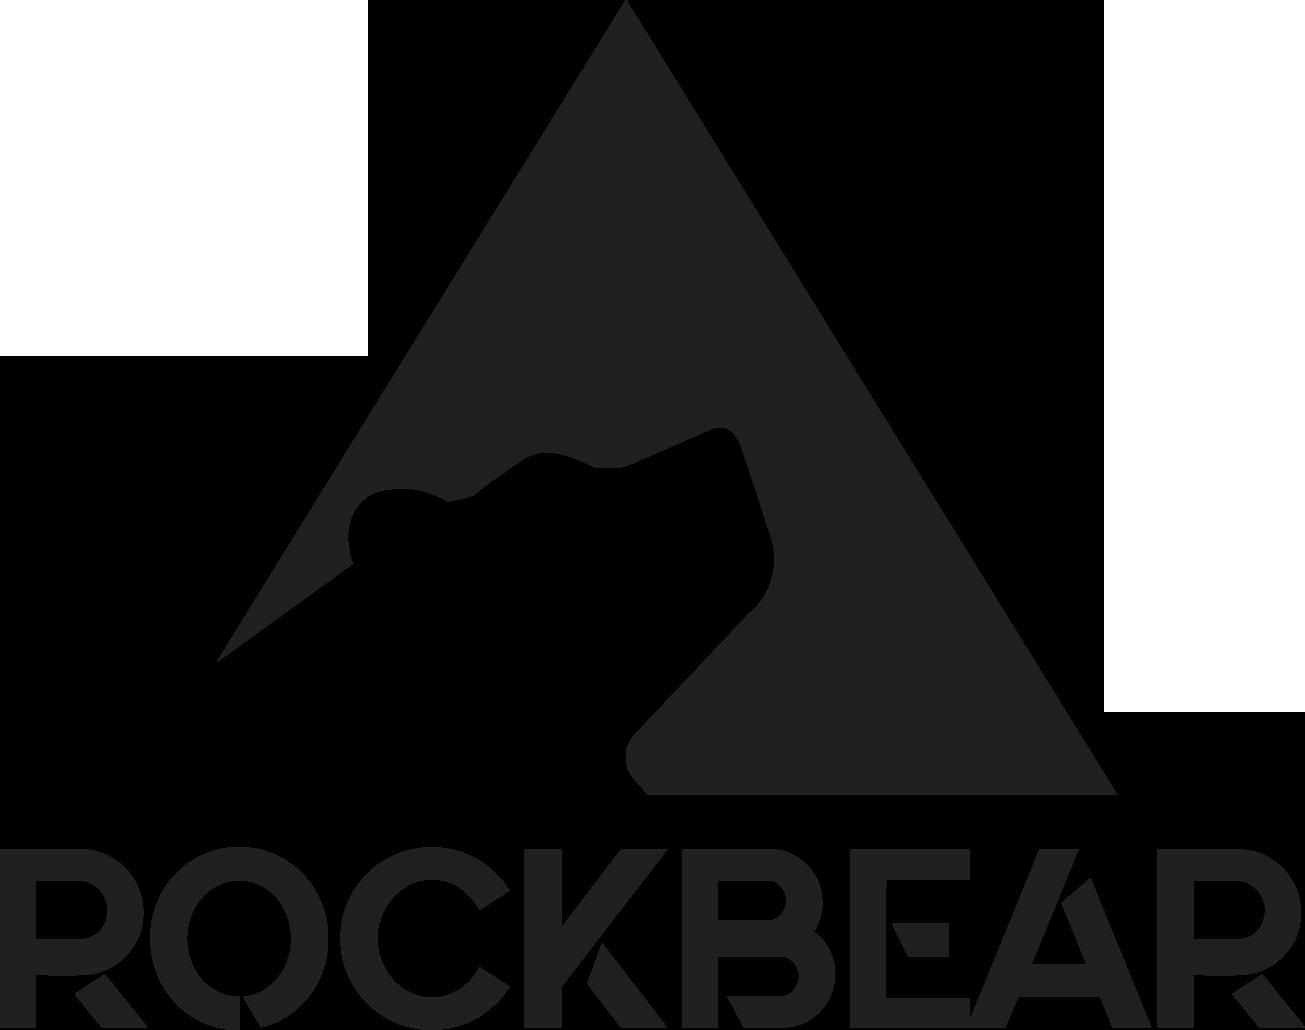 rockbear